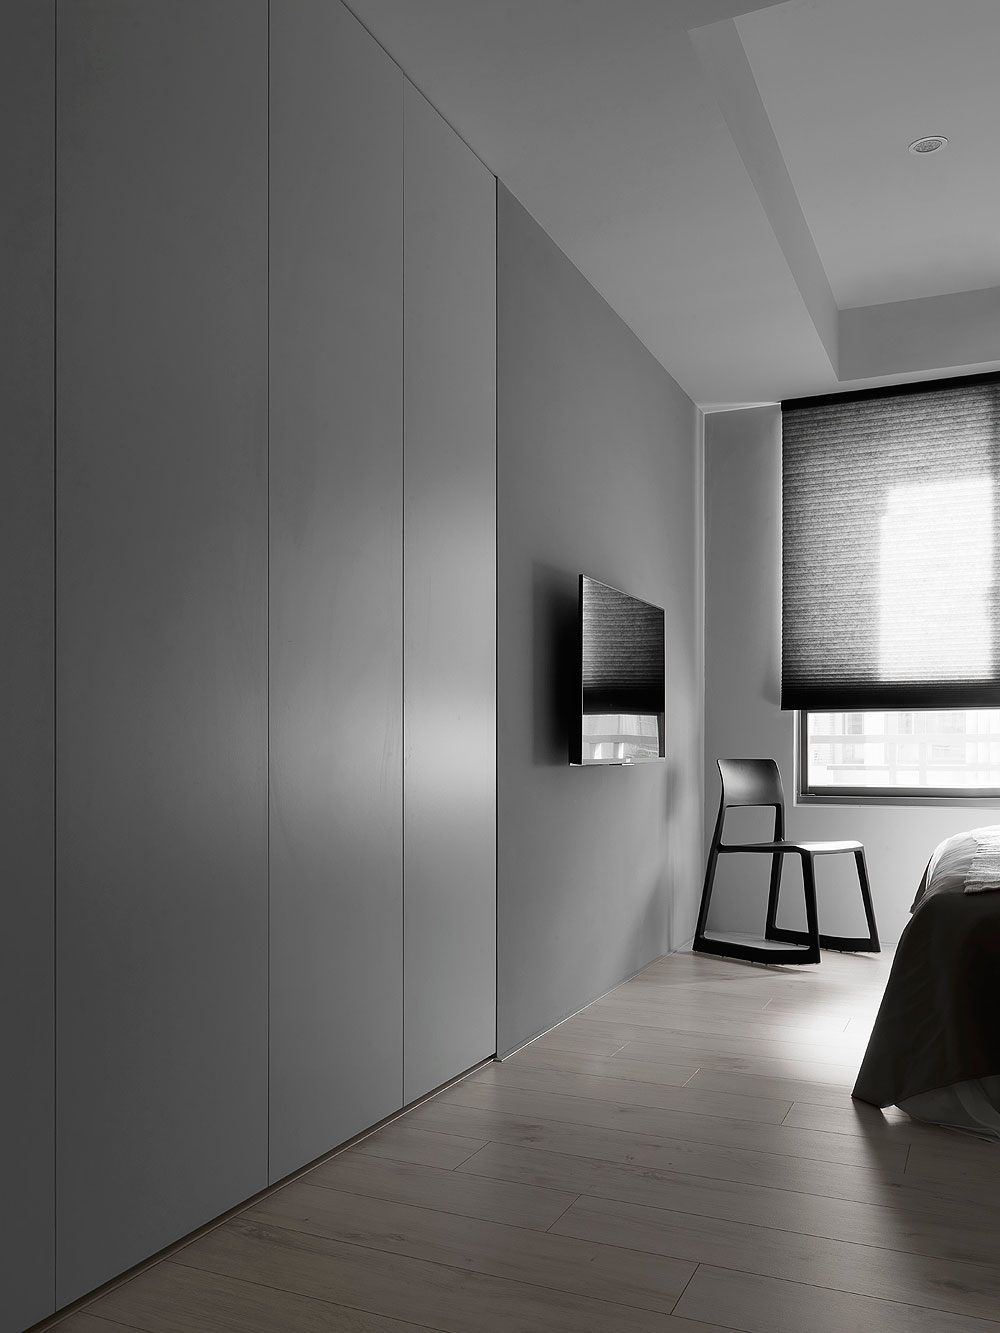 h-residence-z-axis-design (16)